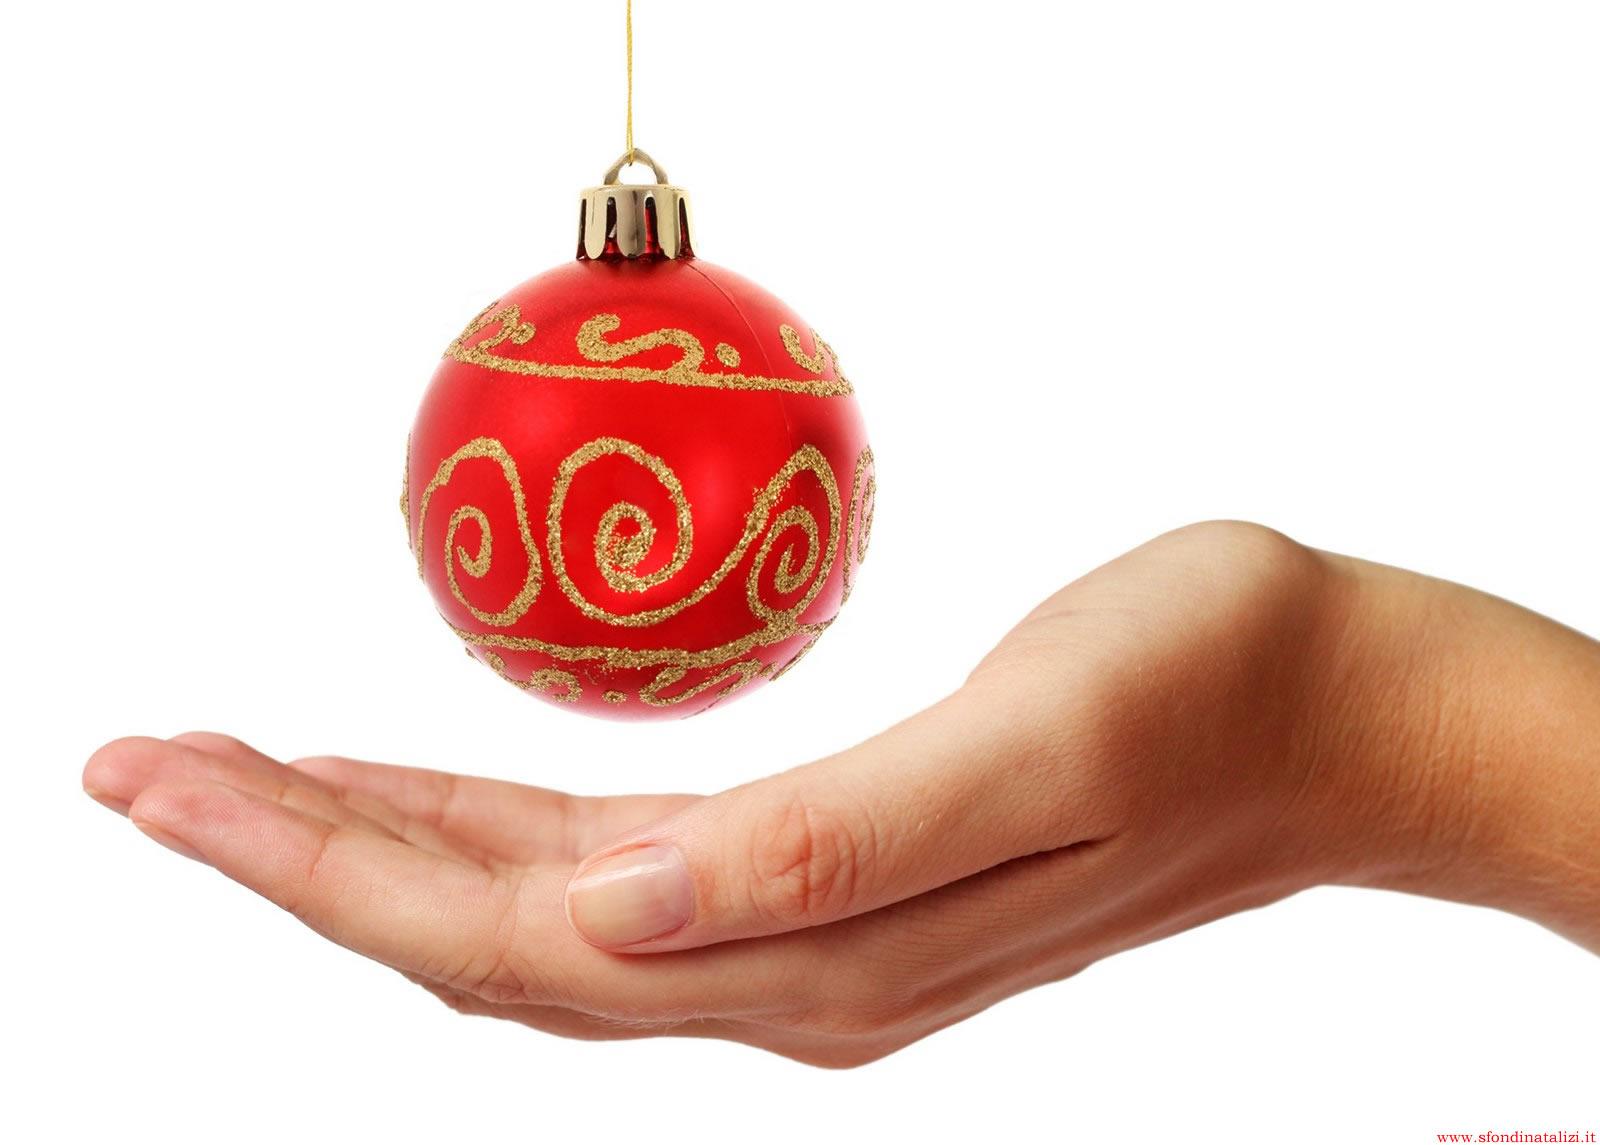 Sfondo Natalizio - Sfondo natalizio Pallina